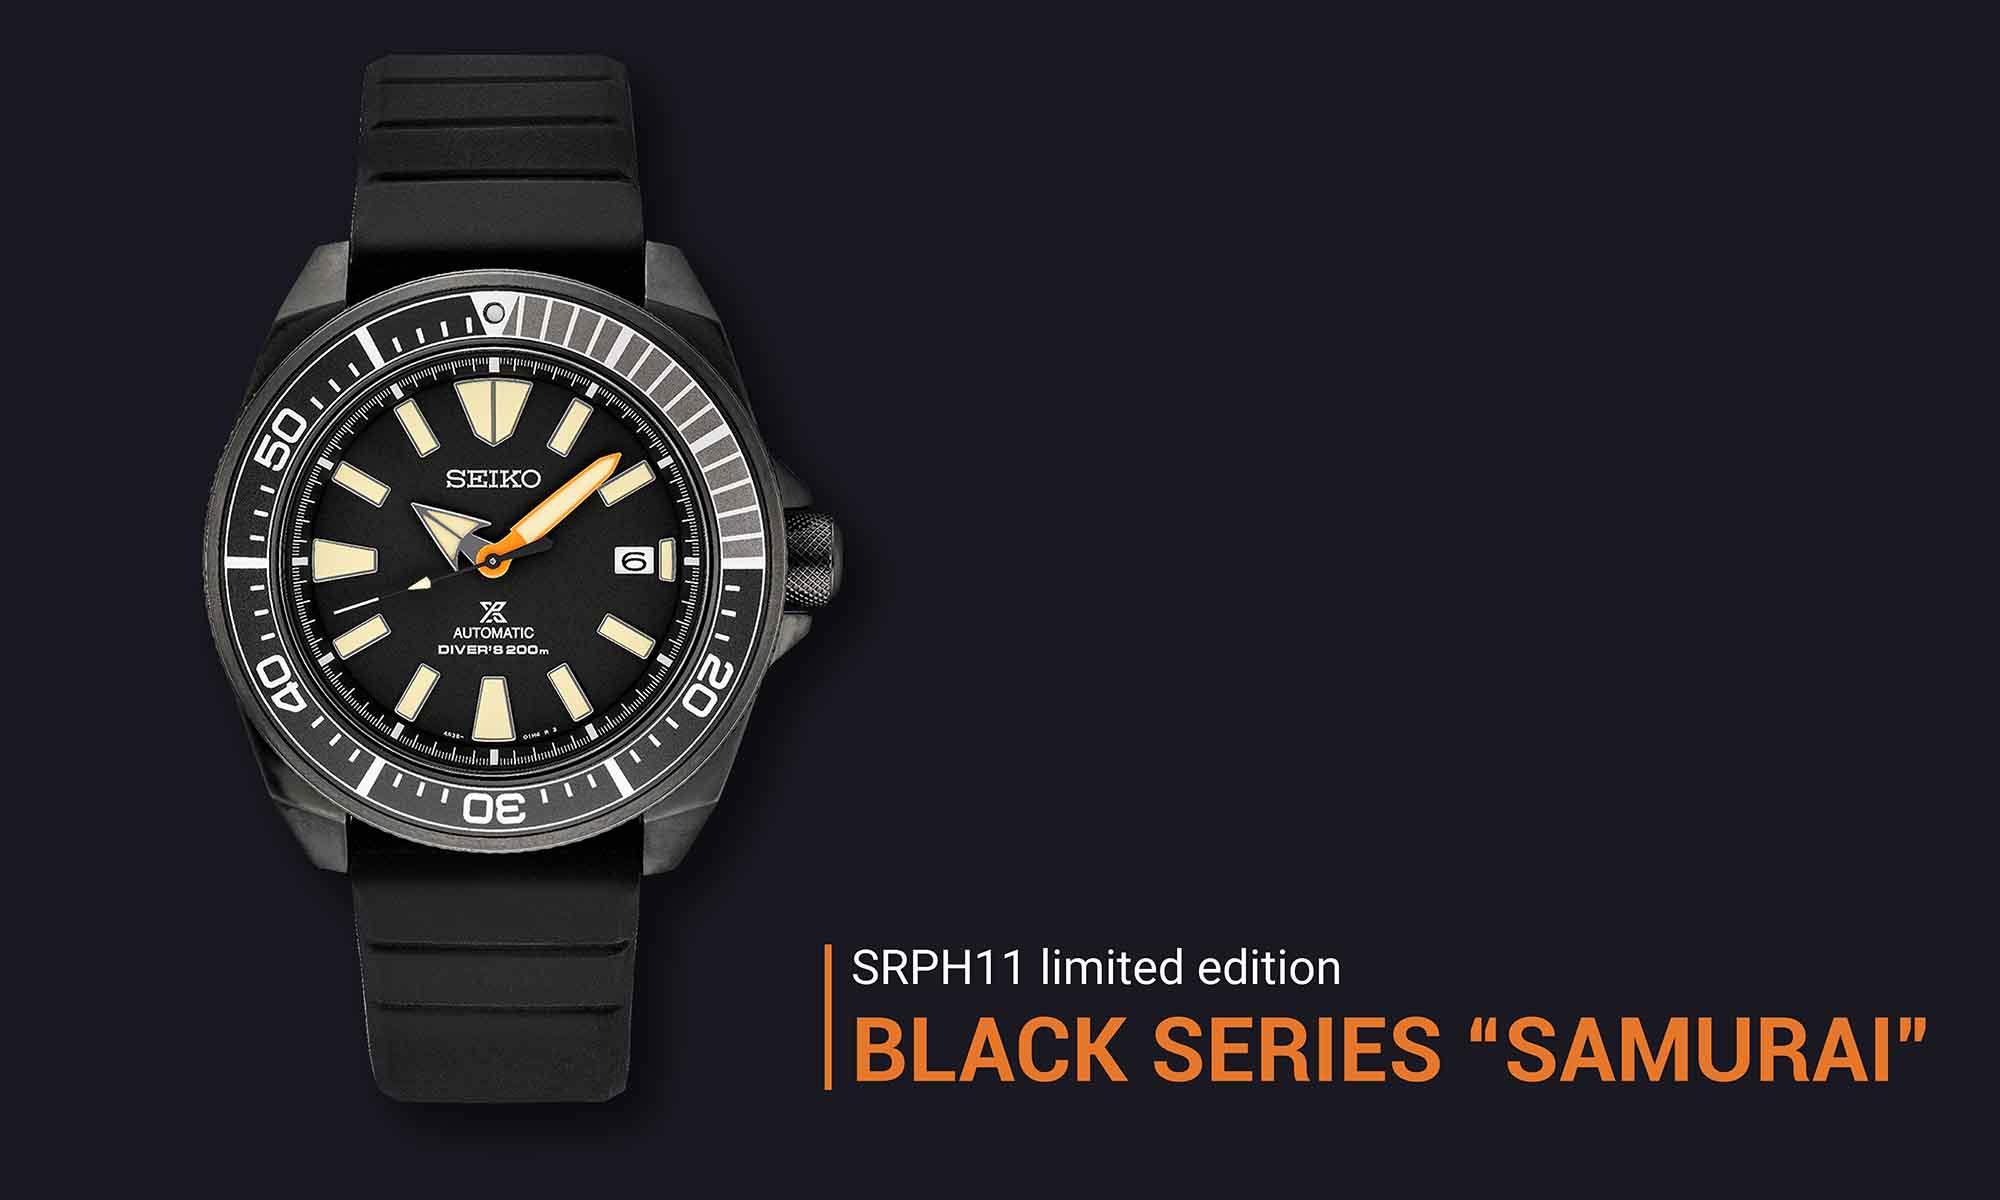 Seiko Prospex Black Series 2021 SRPH11 Samurai